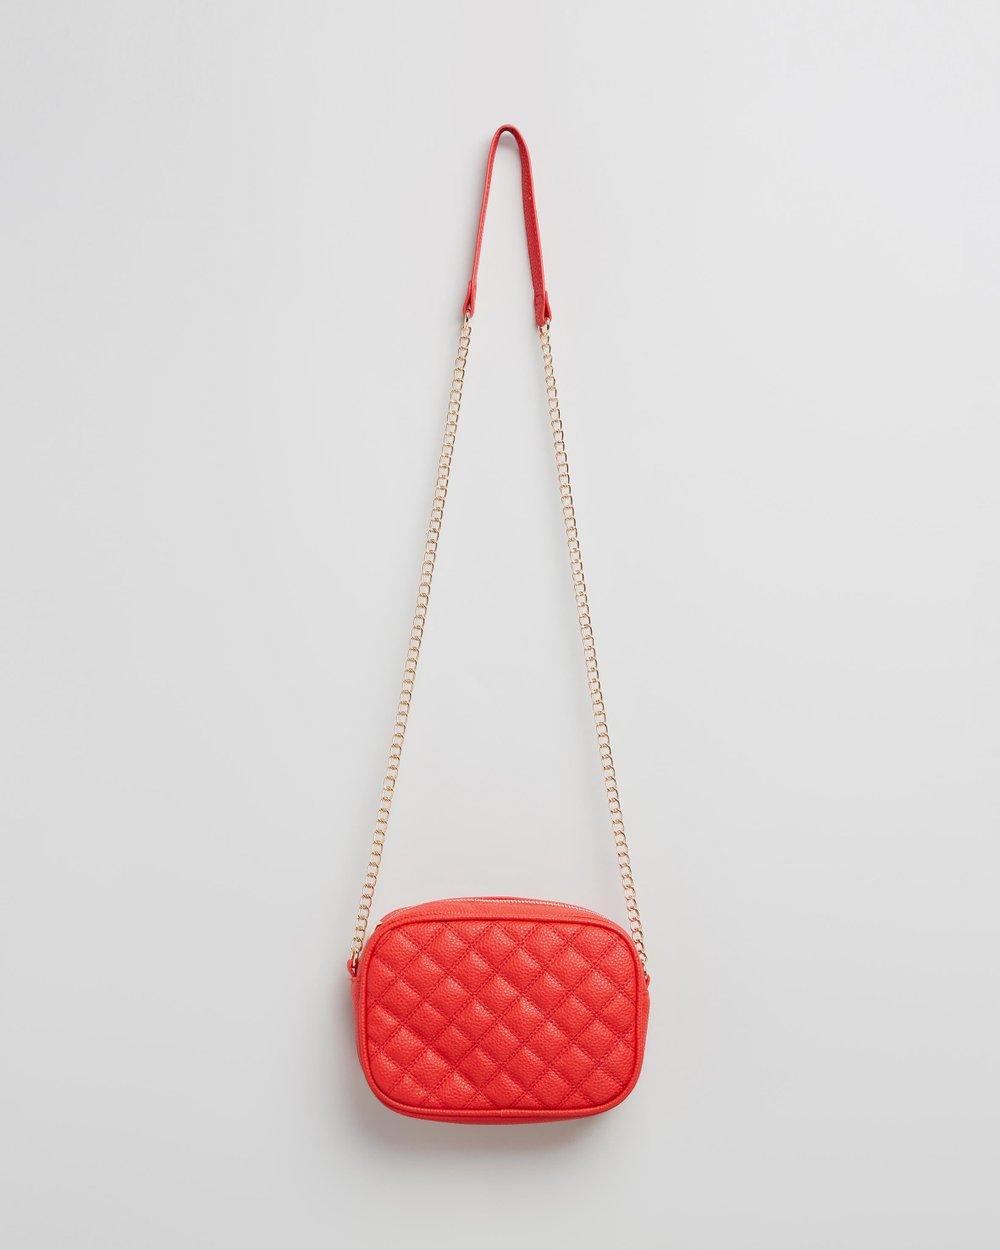 b970217e3007 ICONIC EXCLUSIVE - Georgie Shoulder Bag by Dazie Online